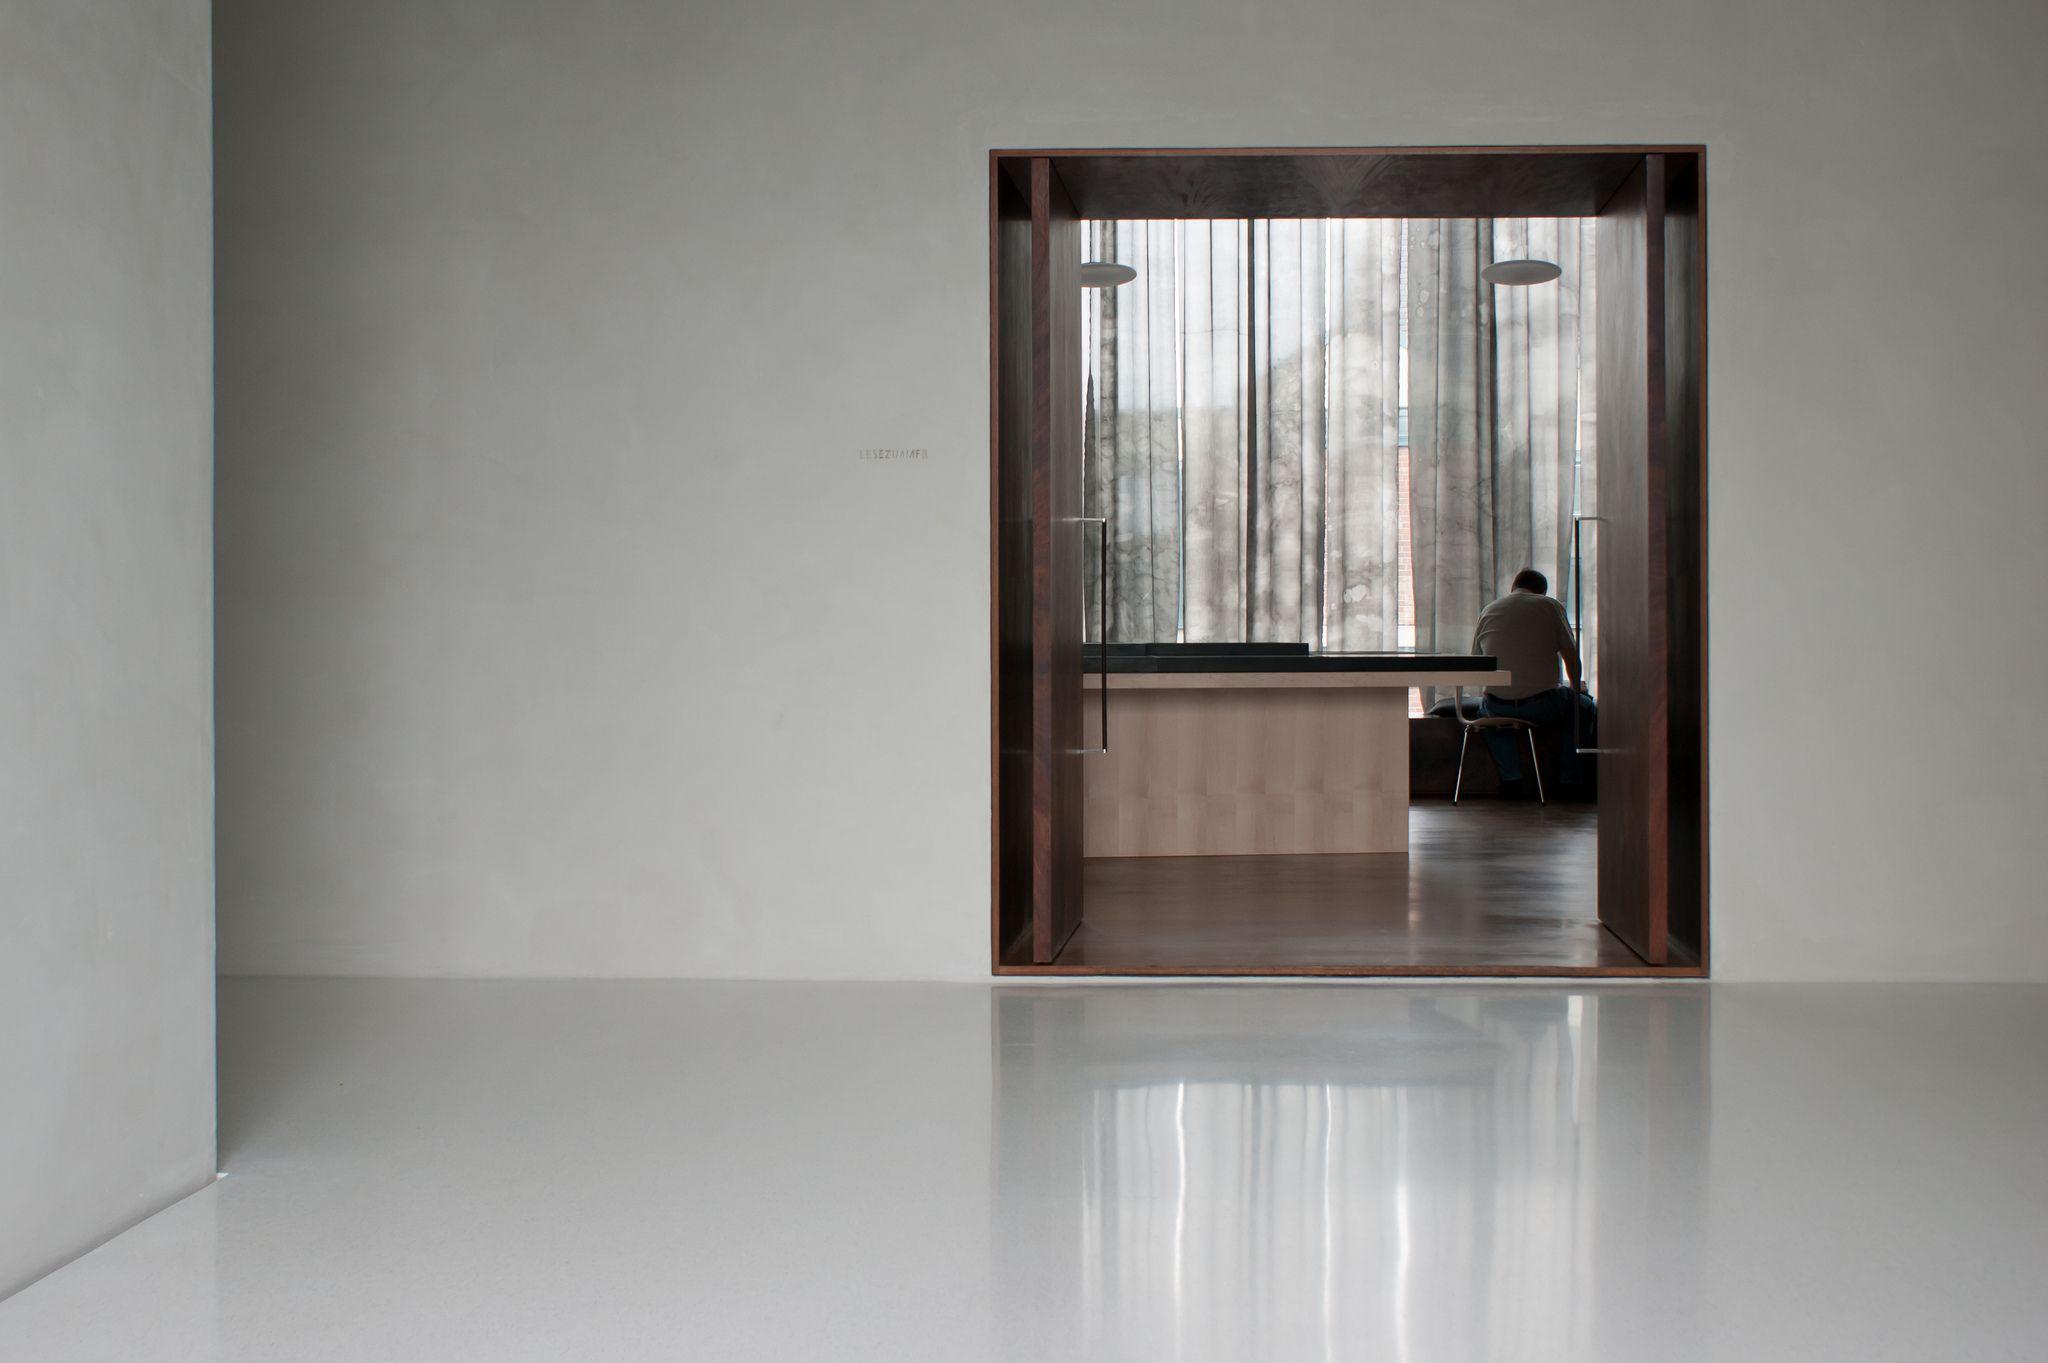 Untitled Peter zumthor, Minimalism interior, Interior